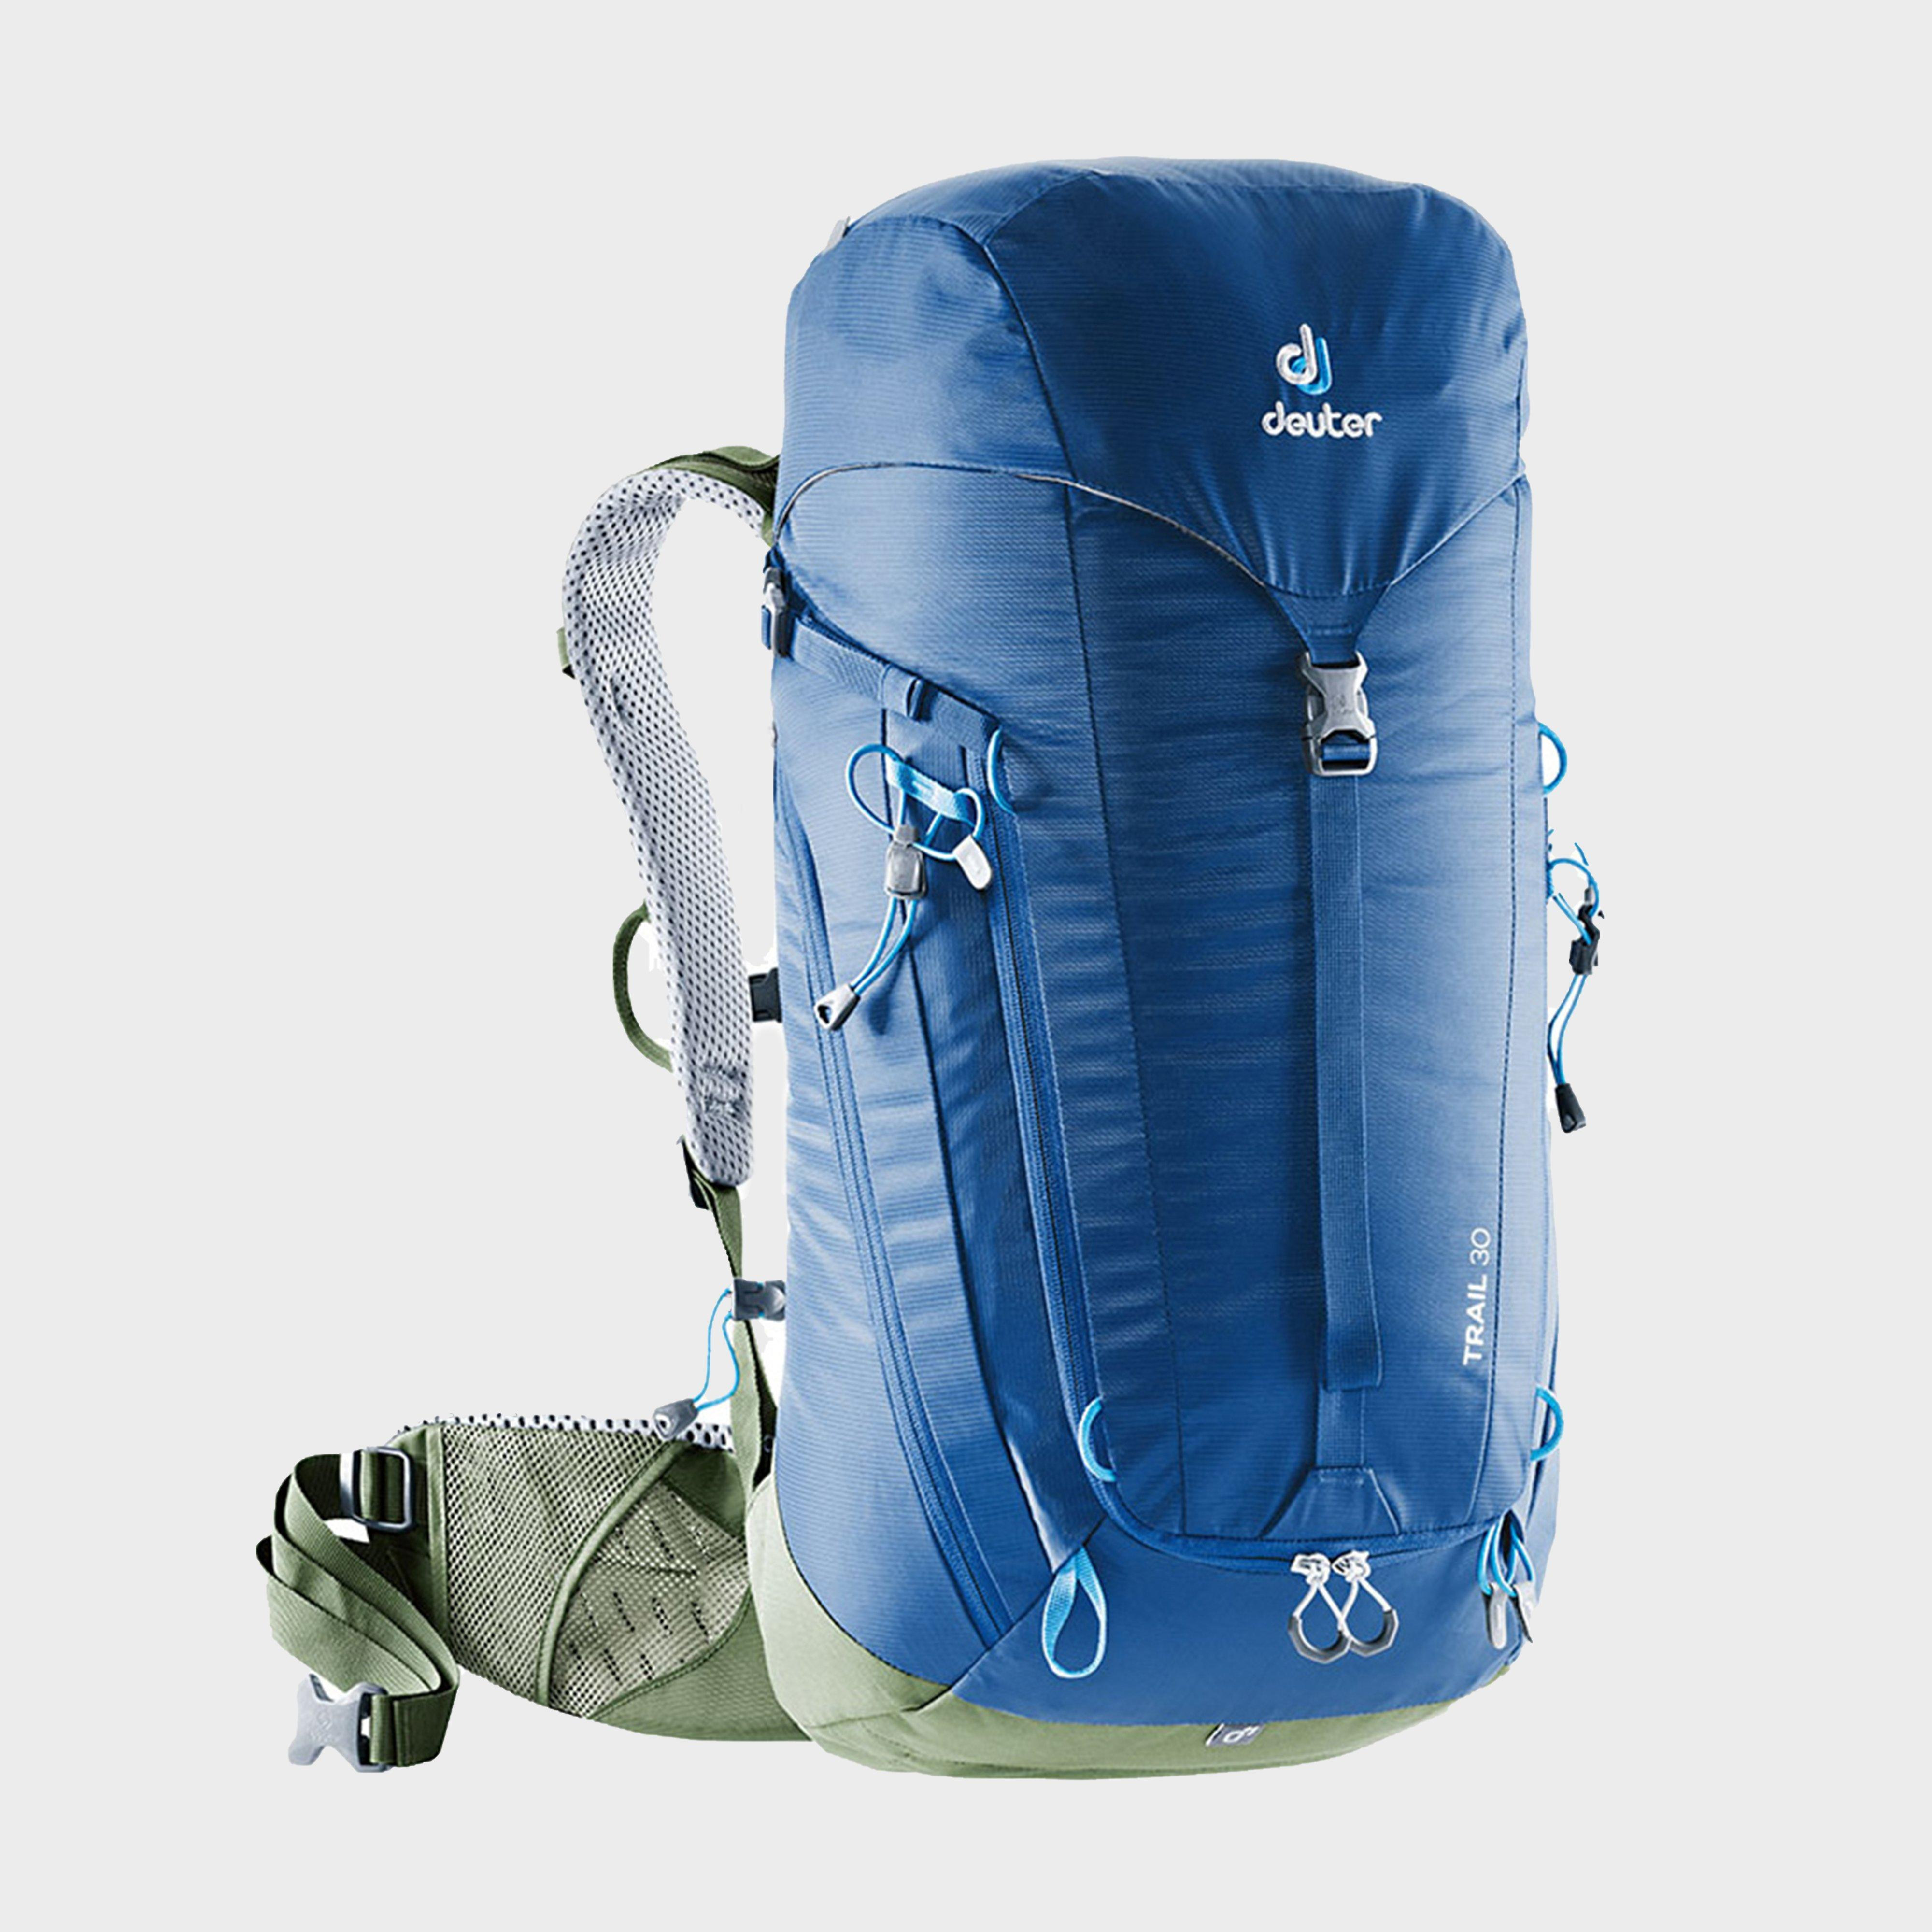 Deuter Deuter Trail 30 Backpack